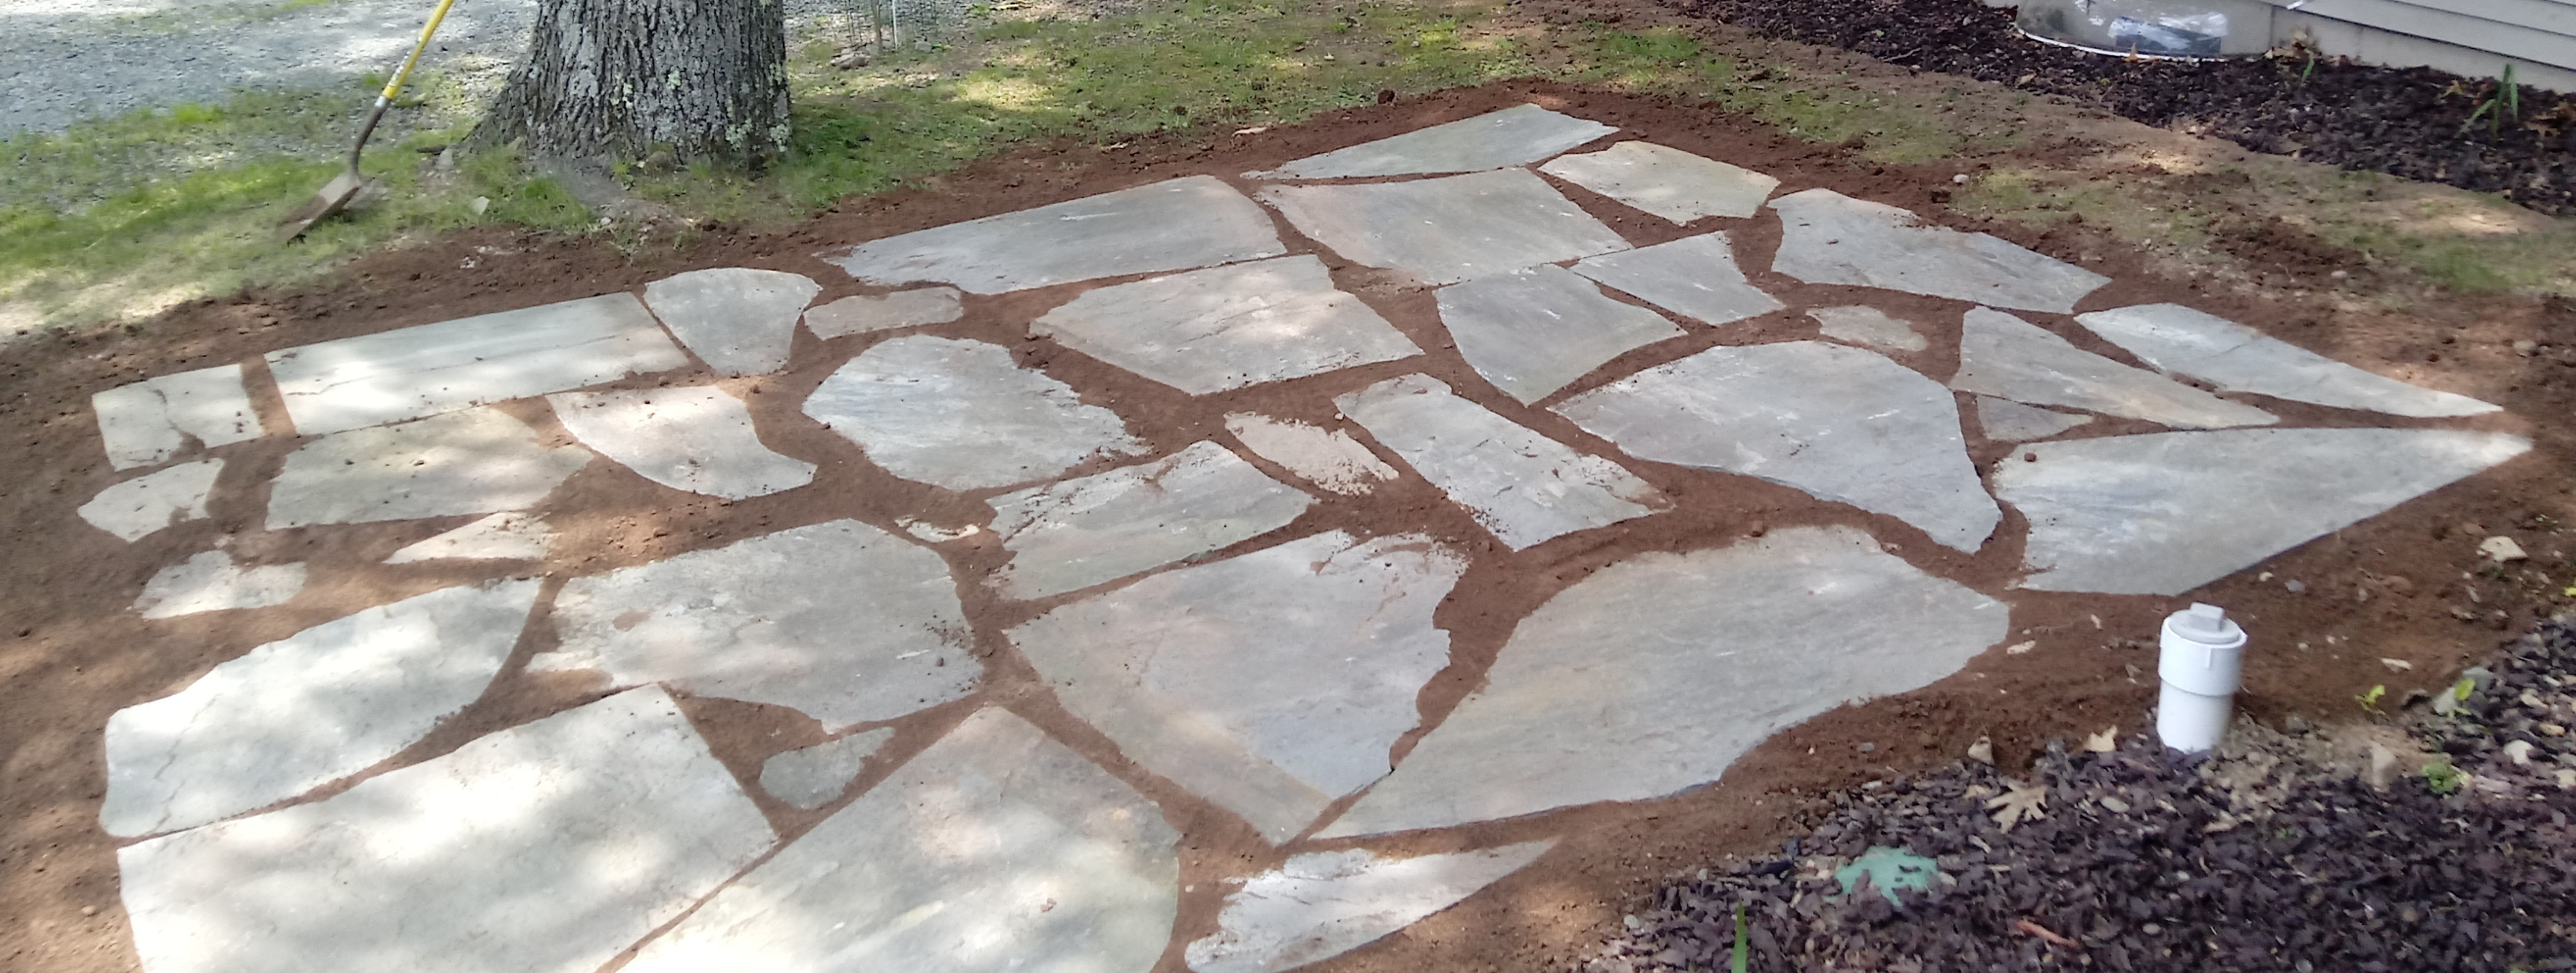 Irregular PA Bluestone Patio by Apple Creek Landscaping LLC